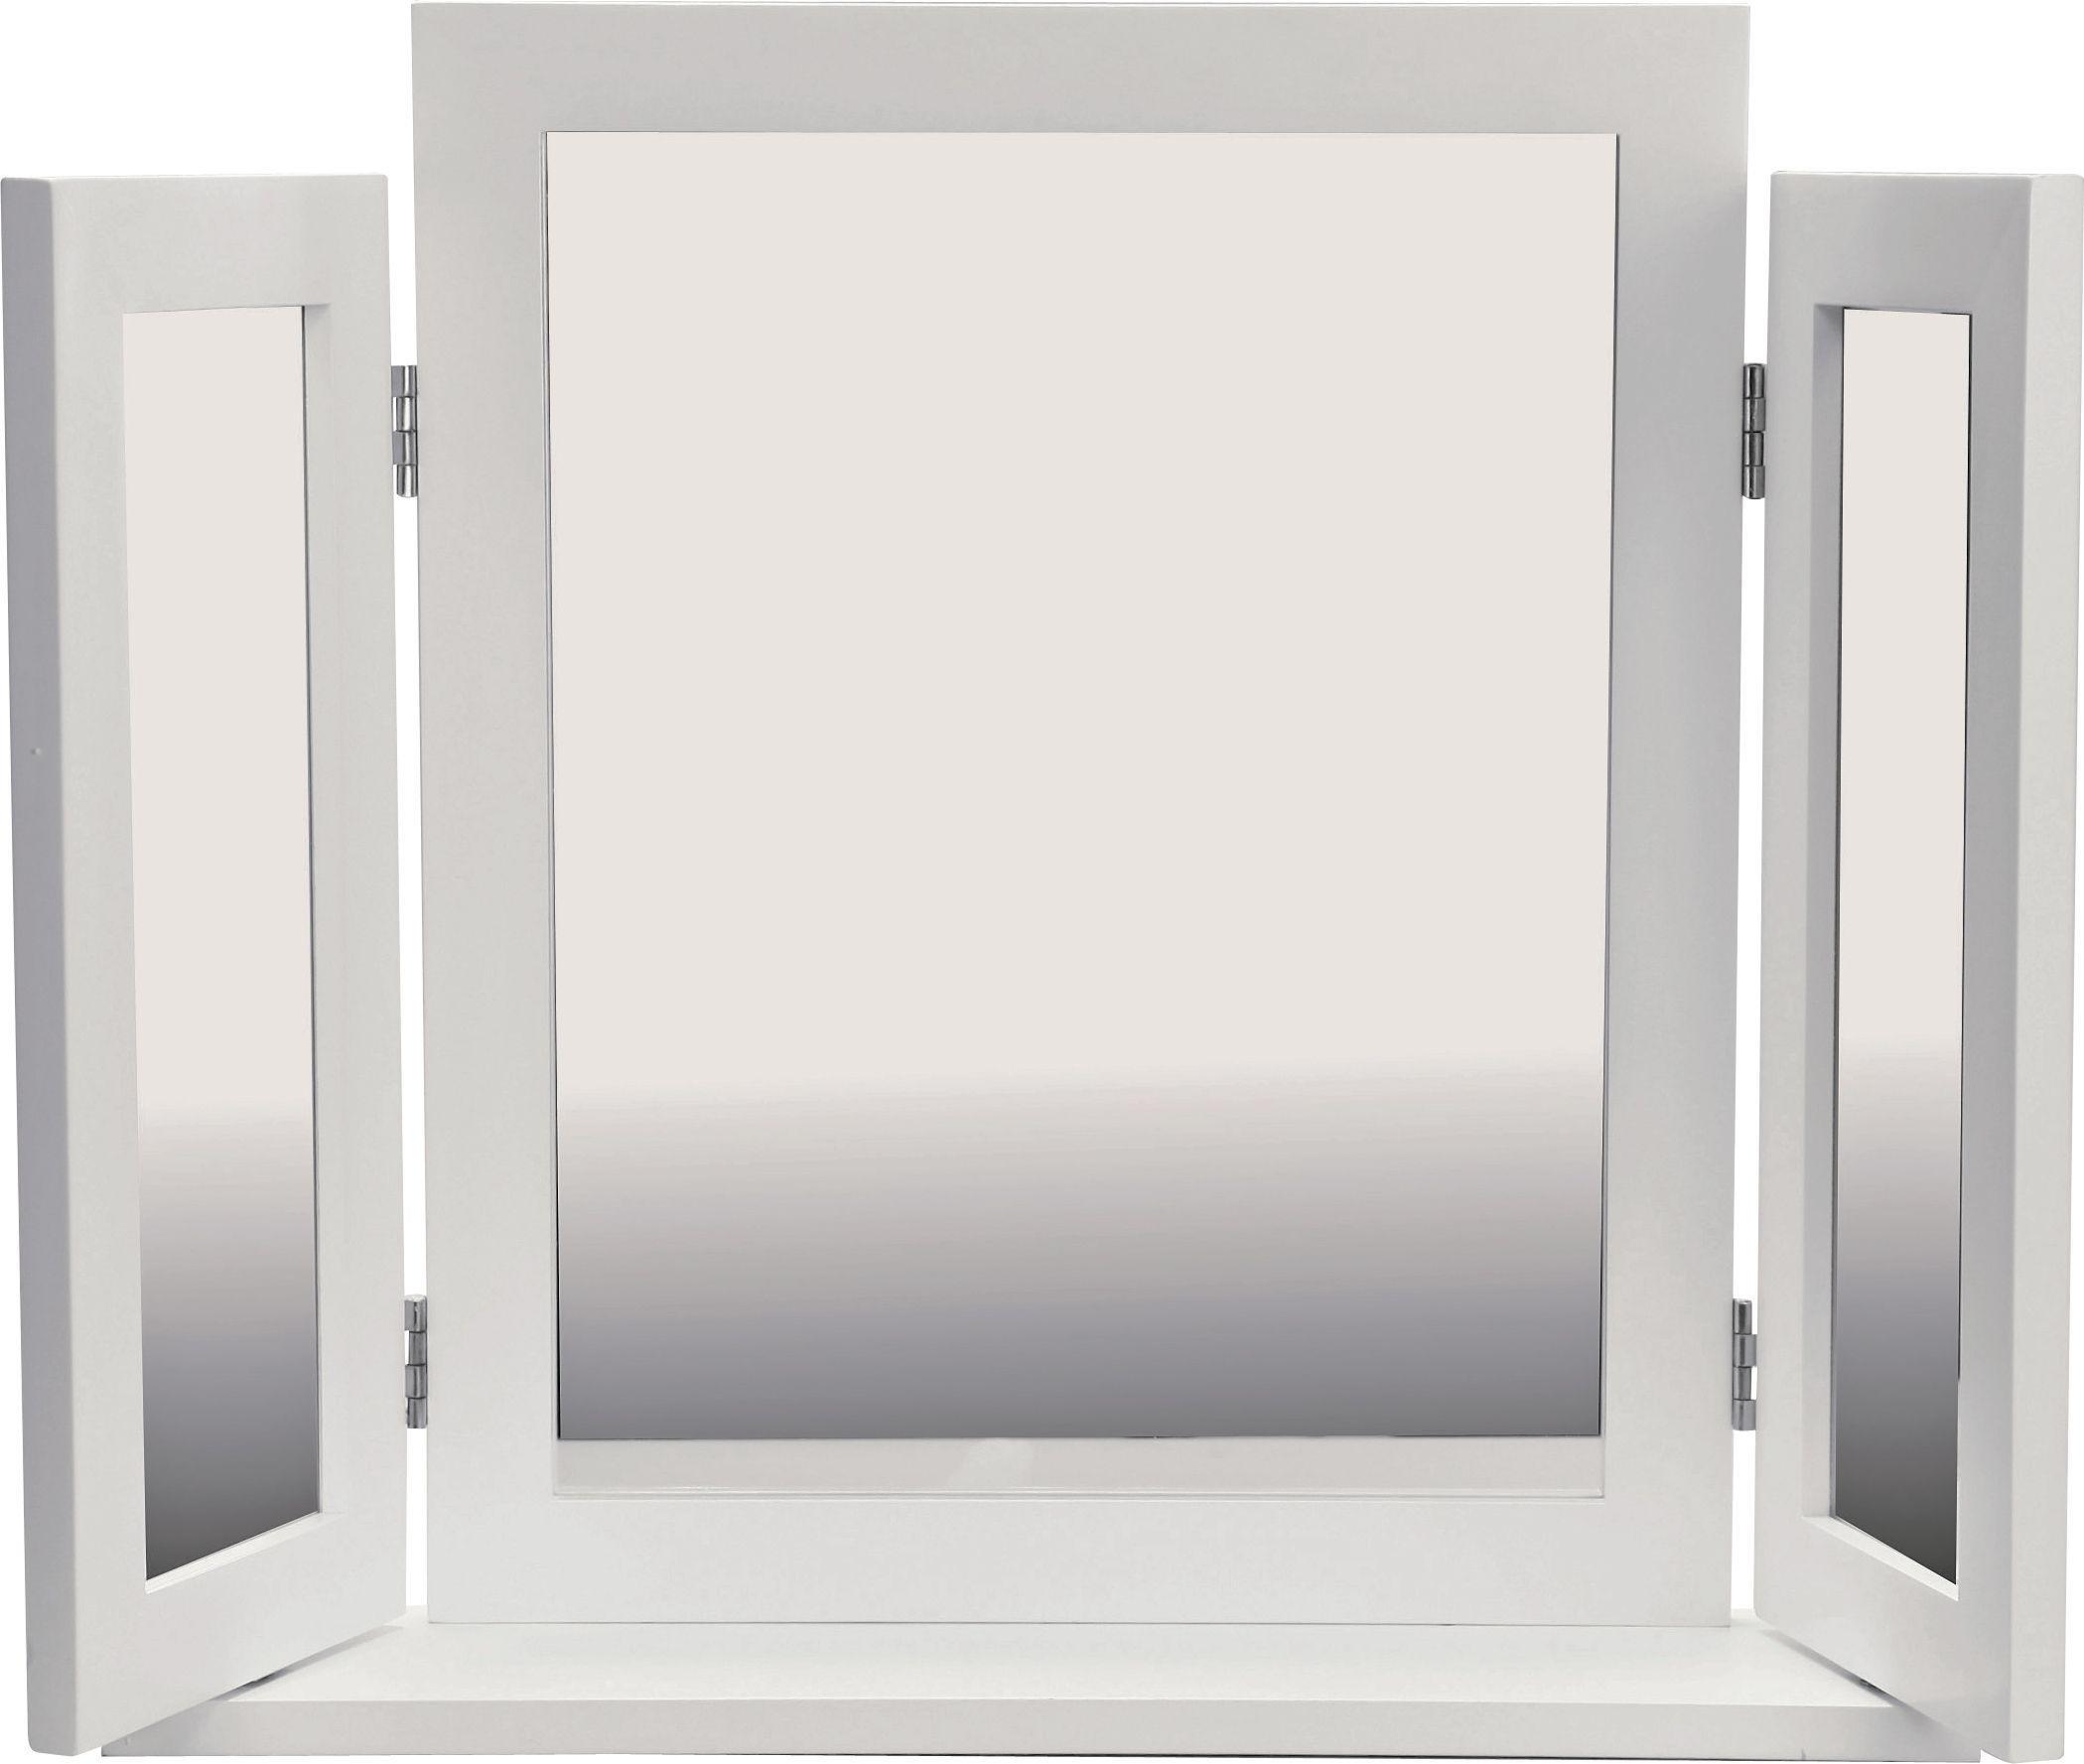 Home triple dressing table mirror white attractive - White mirror for dressing table ...